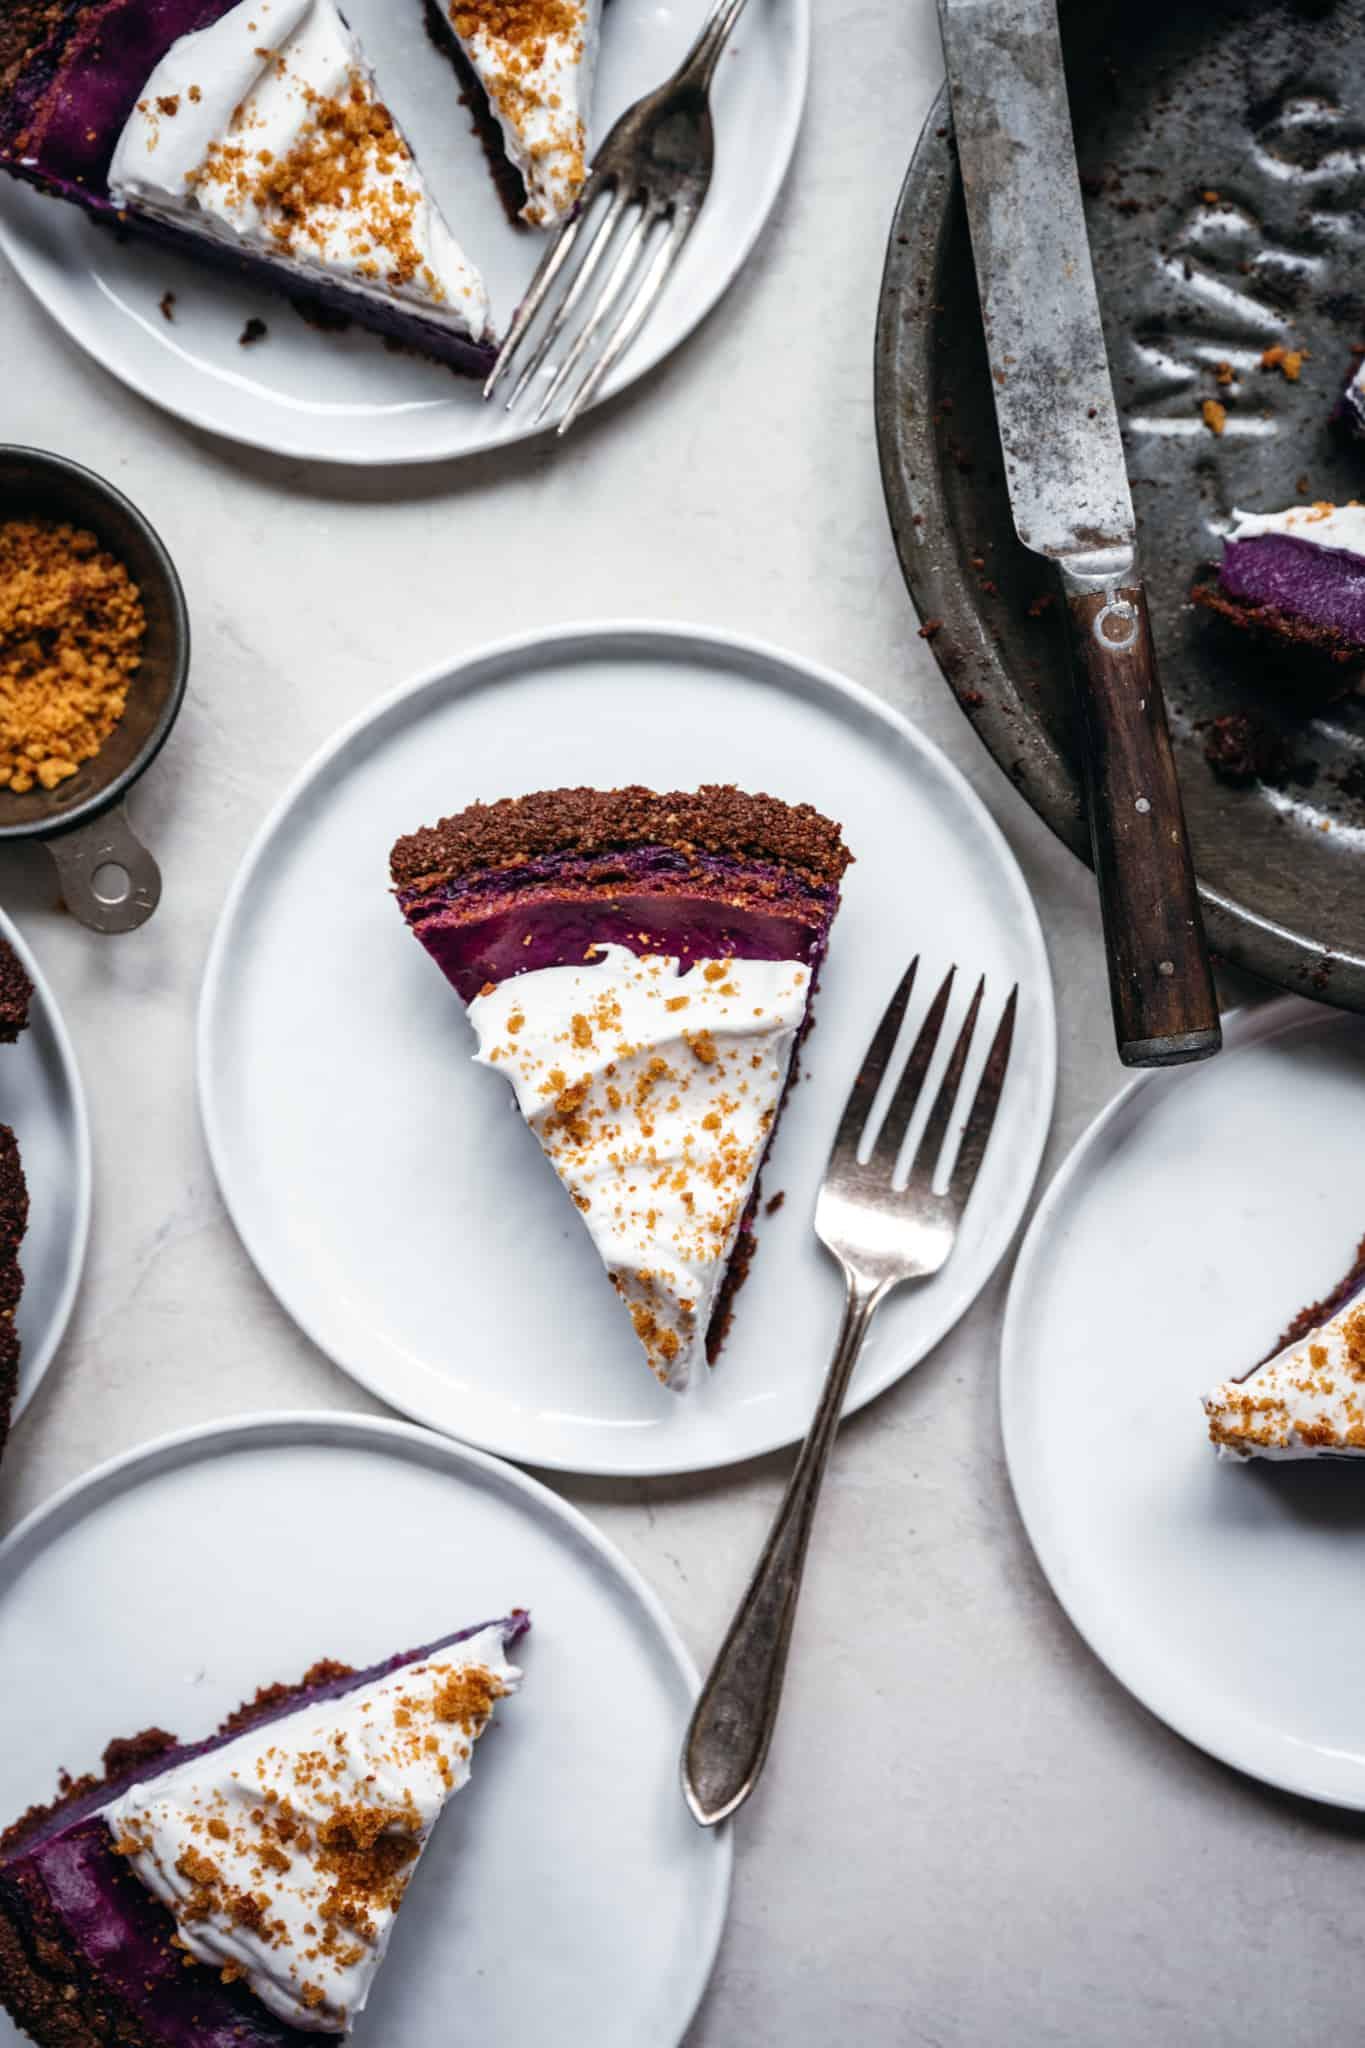 overhead view of slices of vegan purple sweet potato pie on white plates